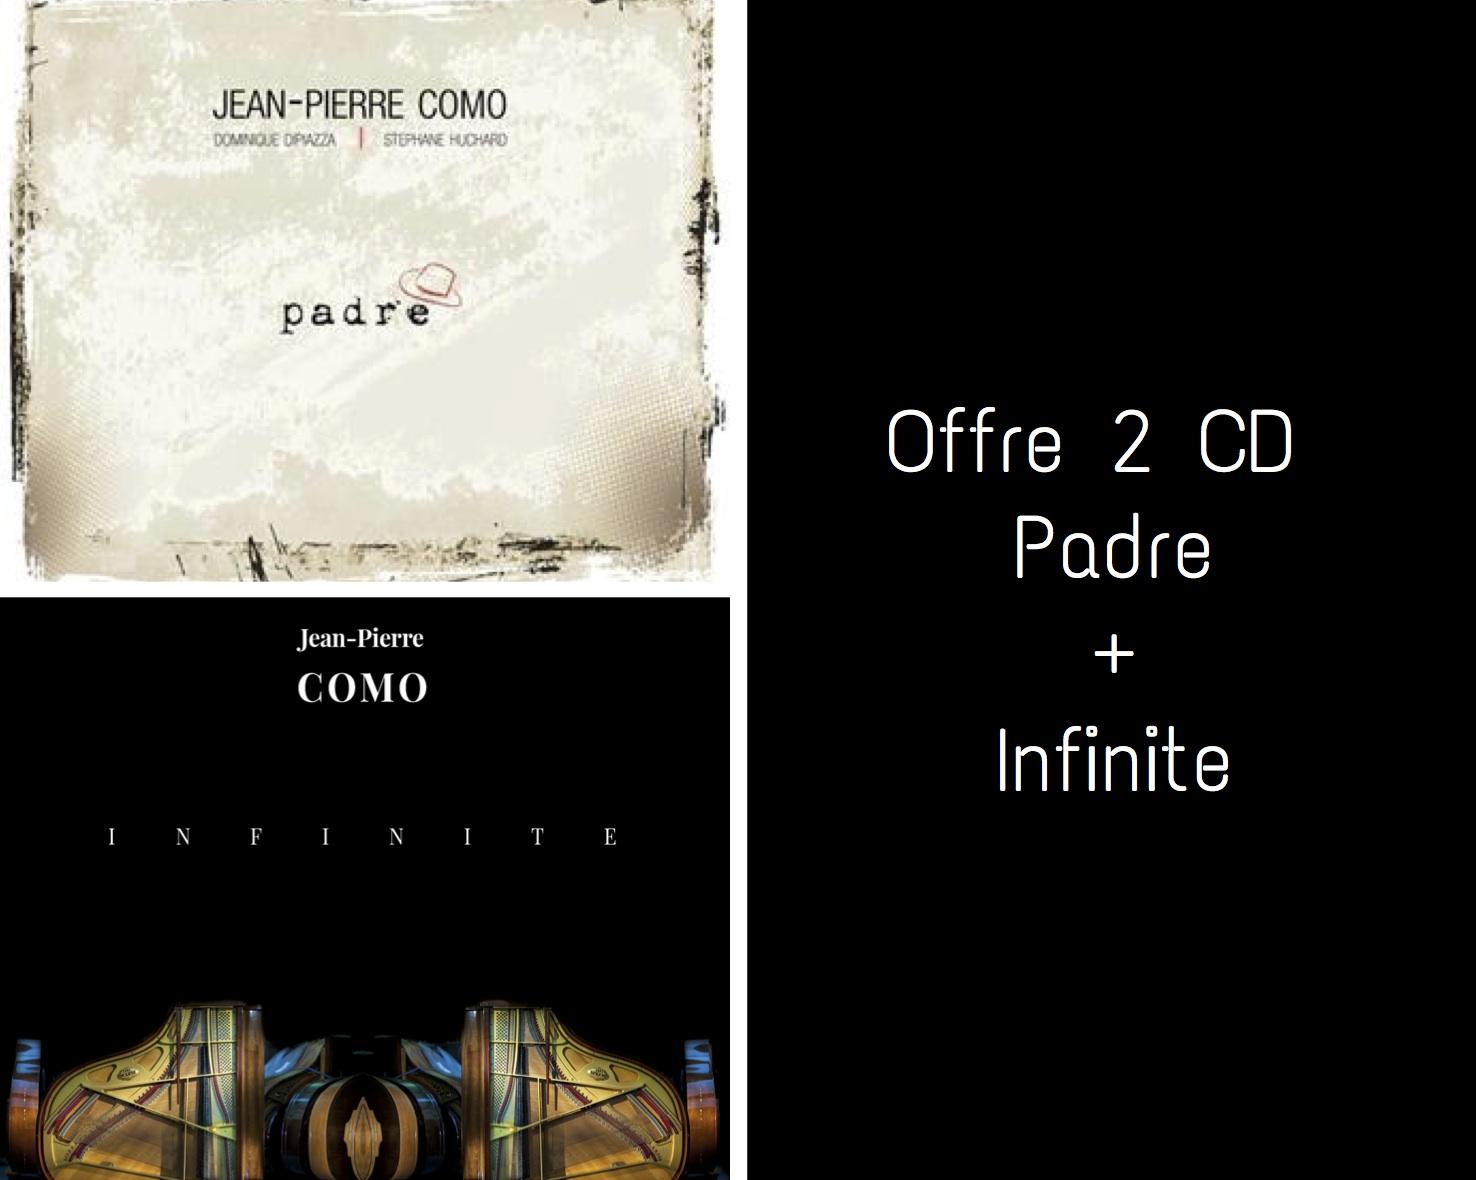 PADRE+Infinite-1526059010.jpg